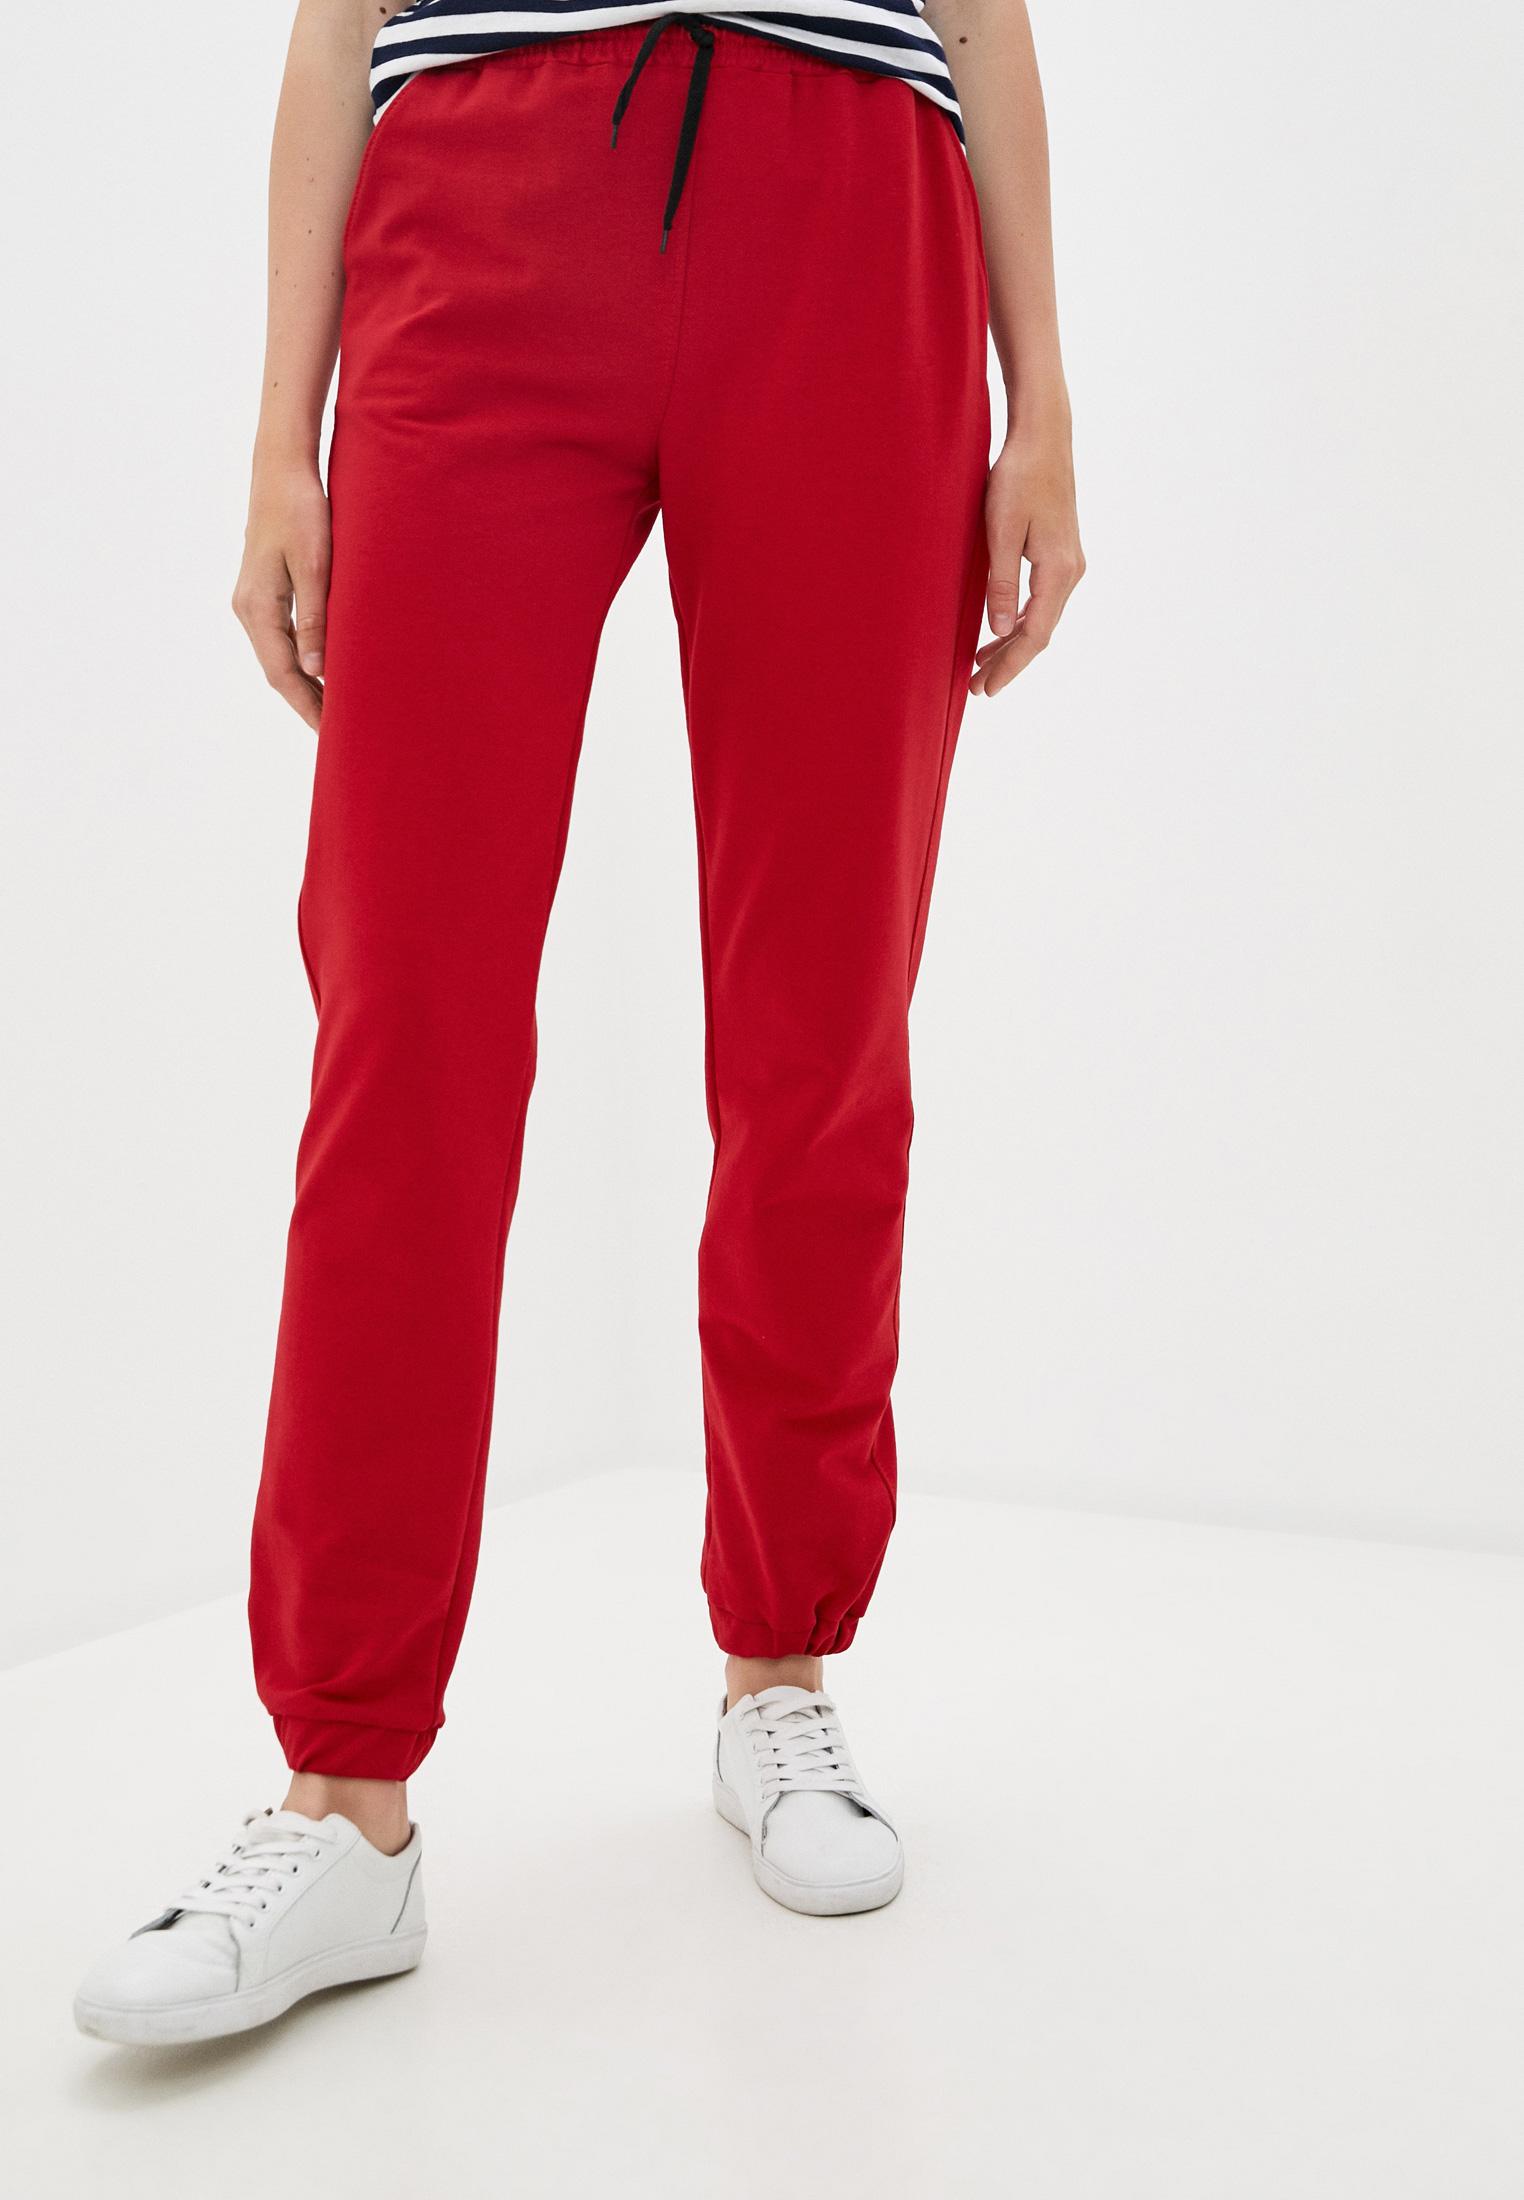 Женские спортивные брюки Pink Frost PF21-BO-W